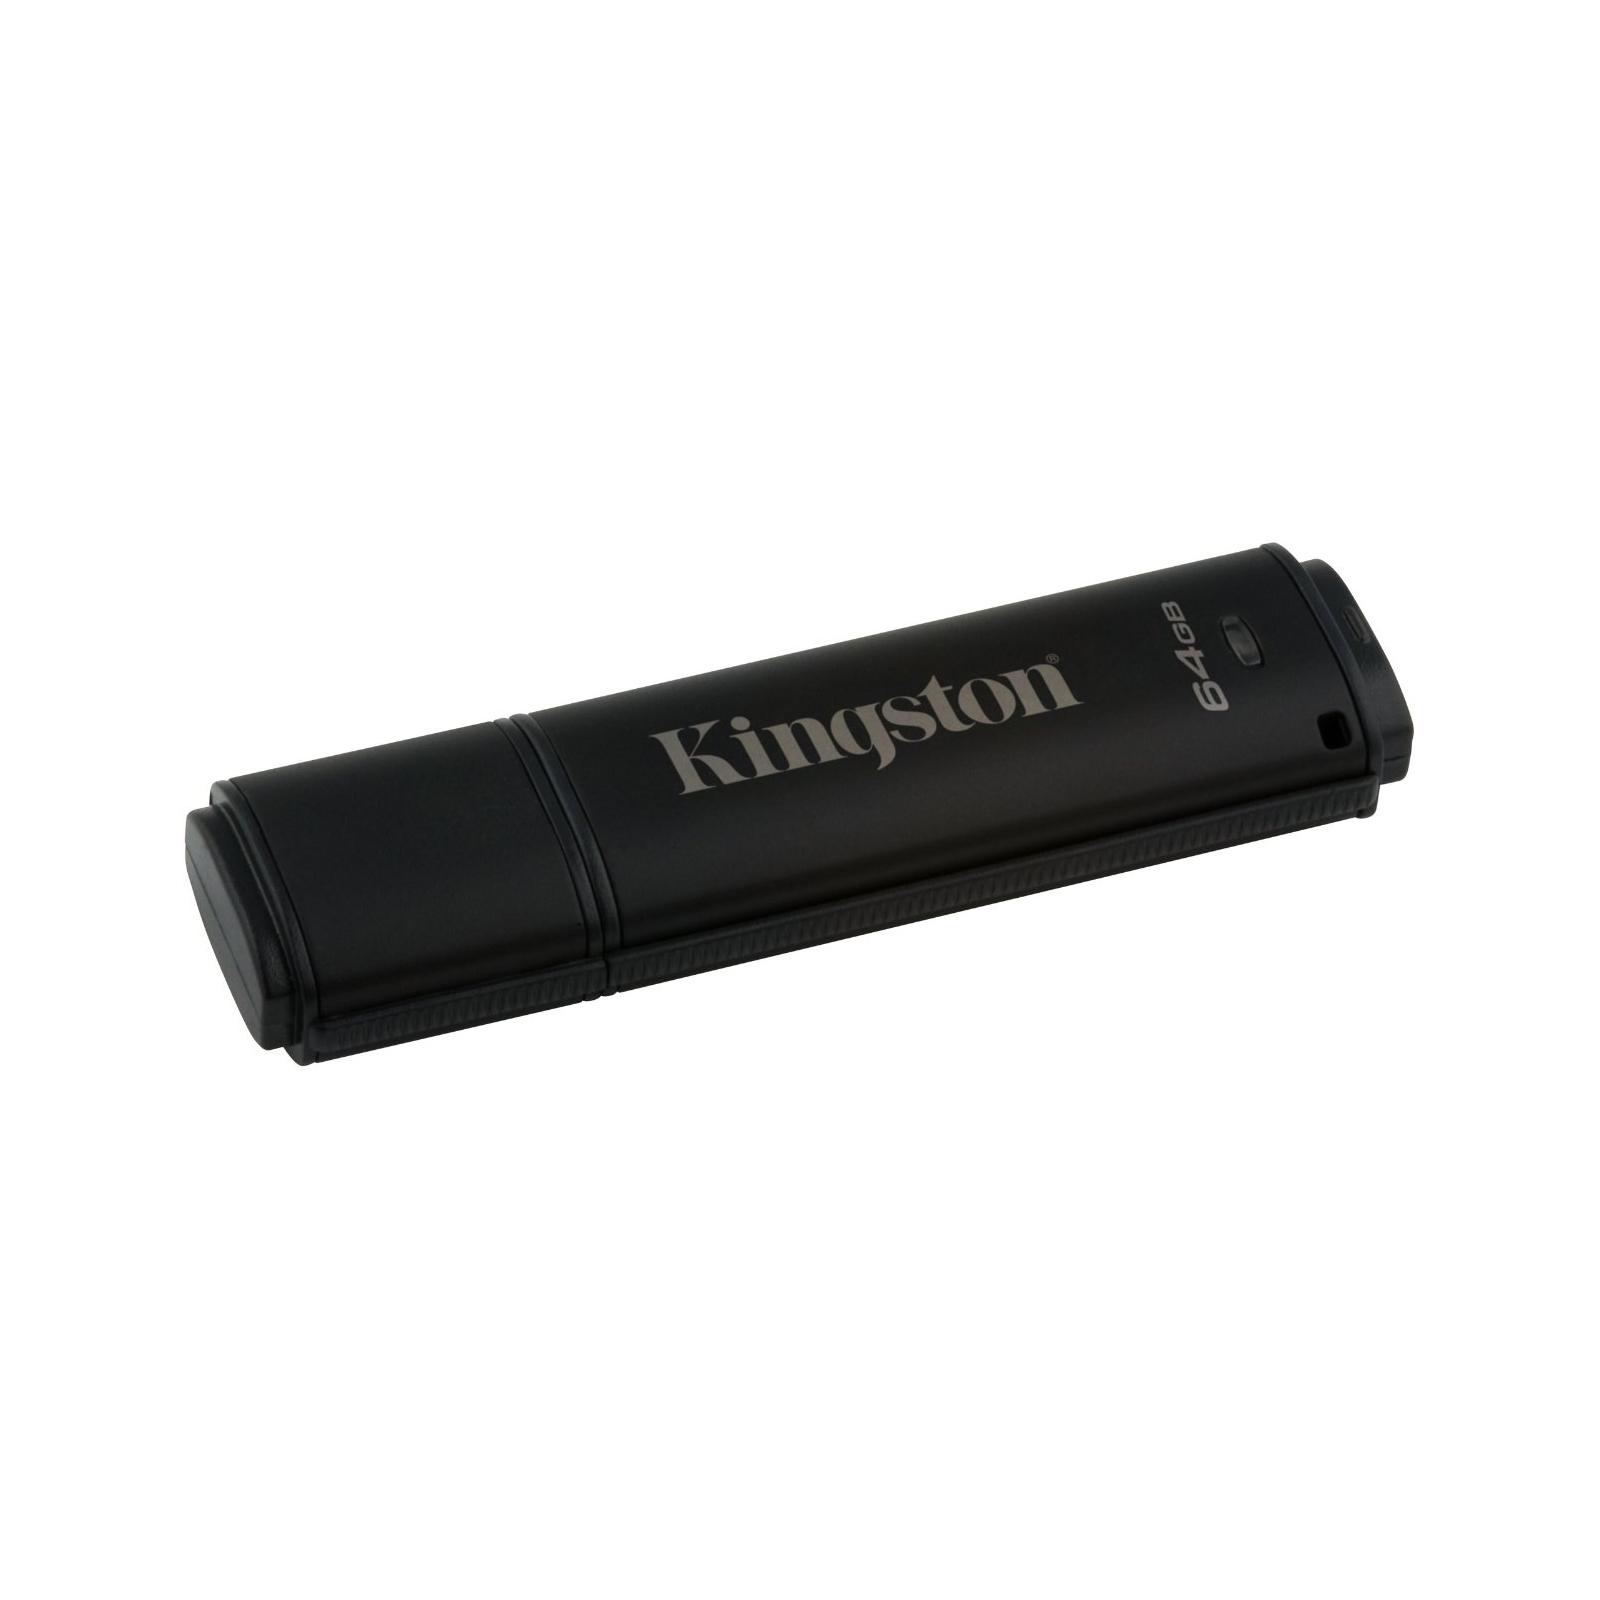 USB флеш накопитель Kingston 64GB DataTraveler 4000 G2 Metal Black USB 3.0 (DT4000G2/64GB) изображение 2